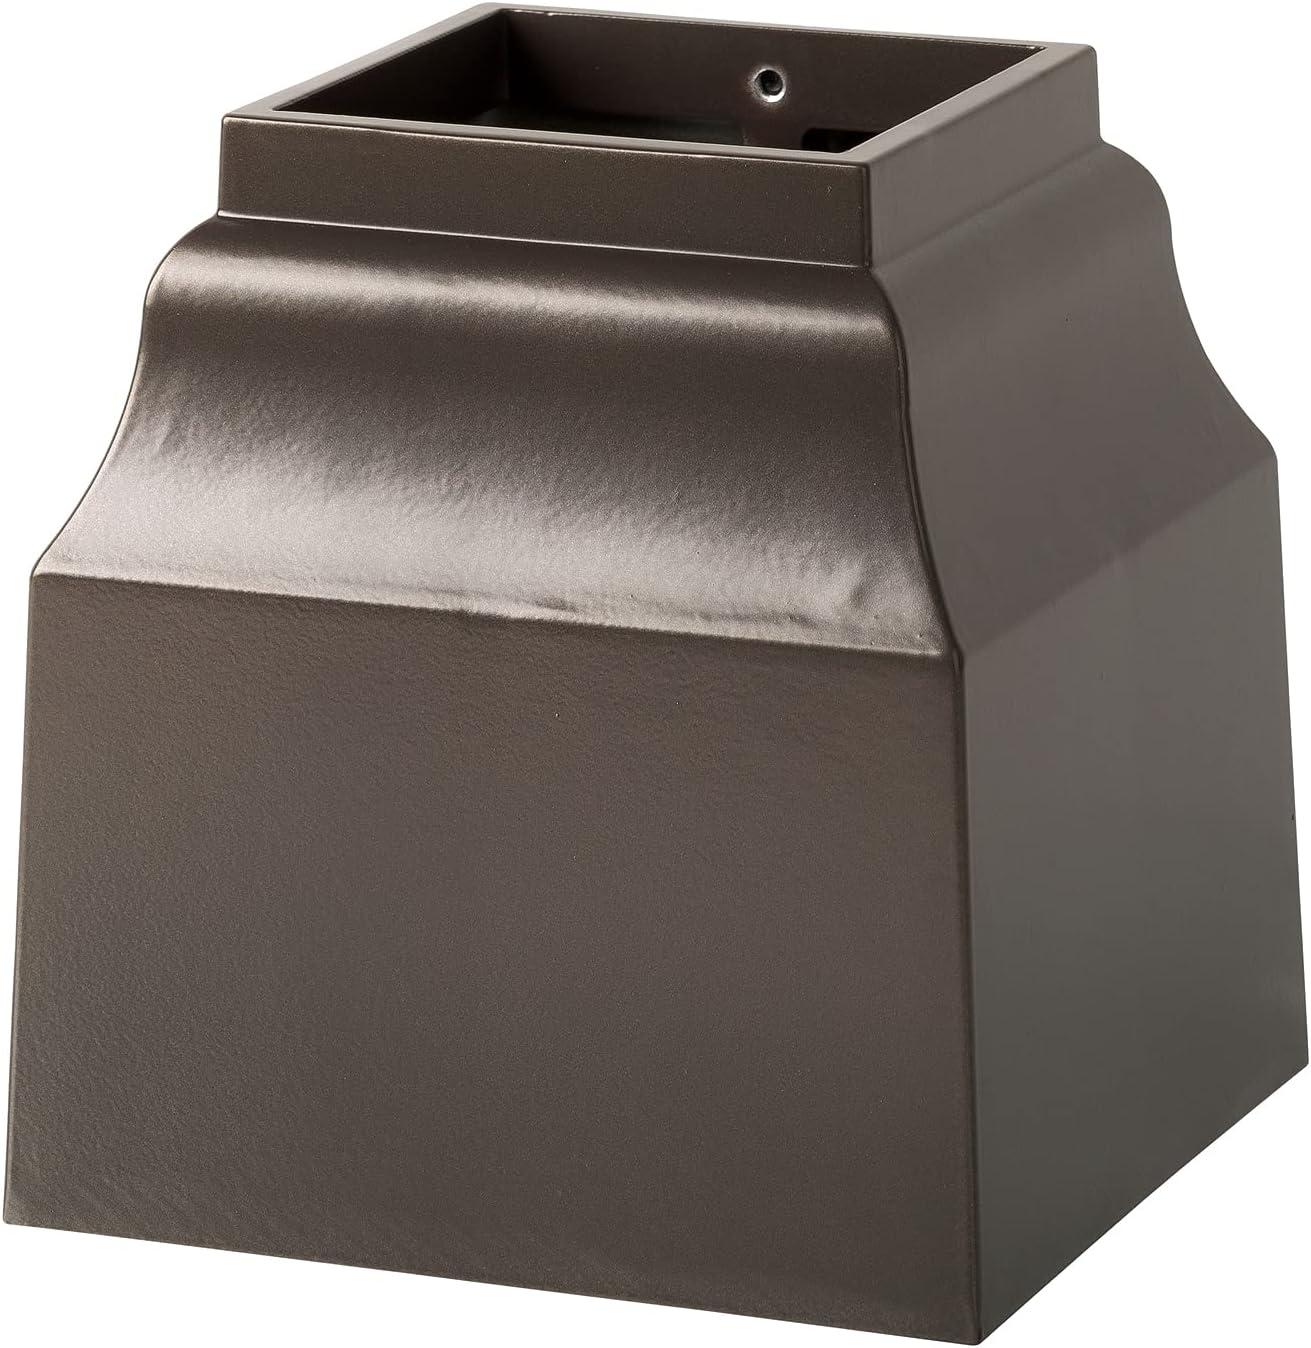 Whitehall 15967 4x4 Base Mailbox Bronze Department store Cascade Max 69% OFF Cuff